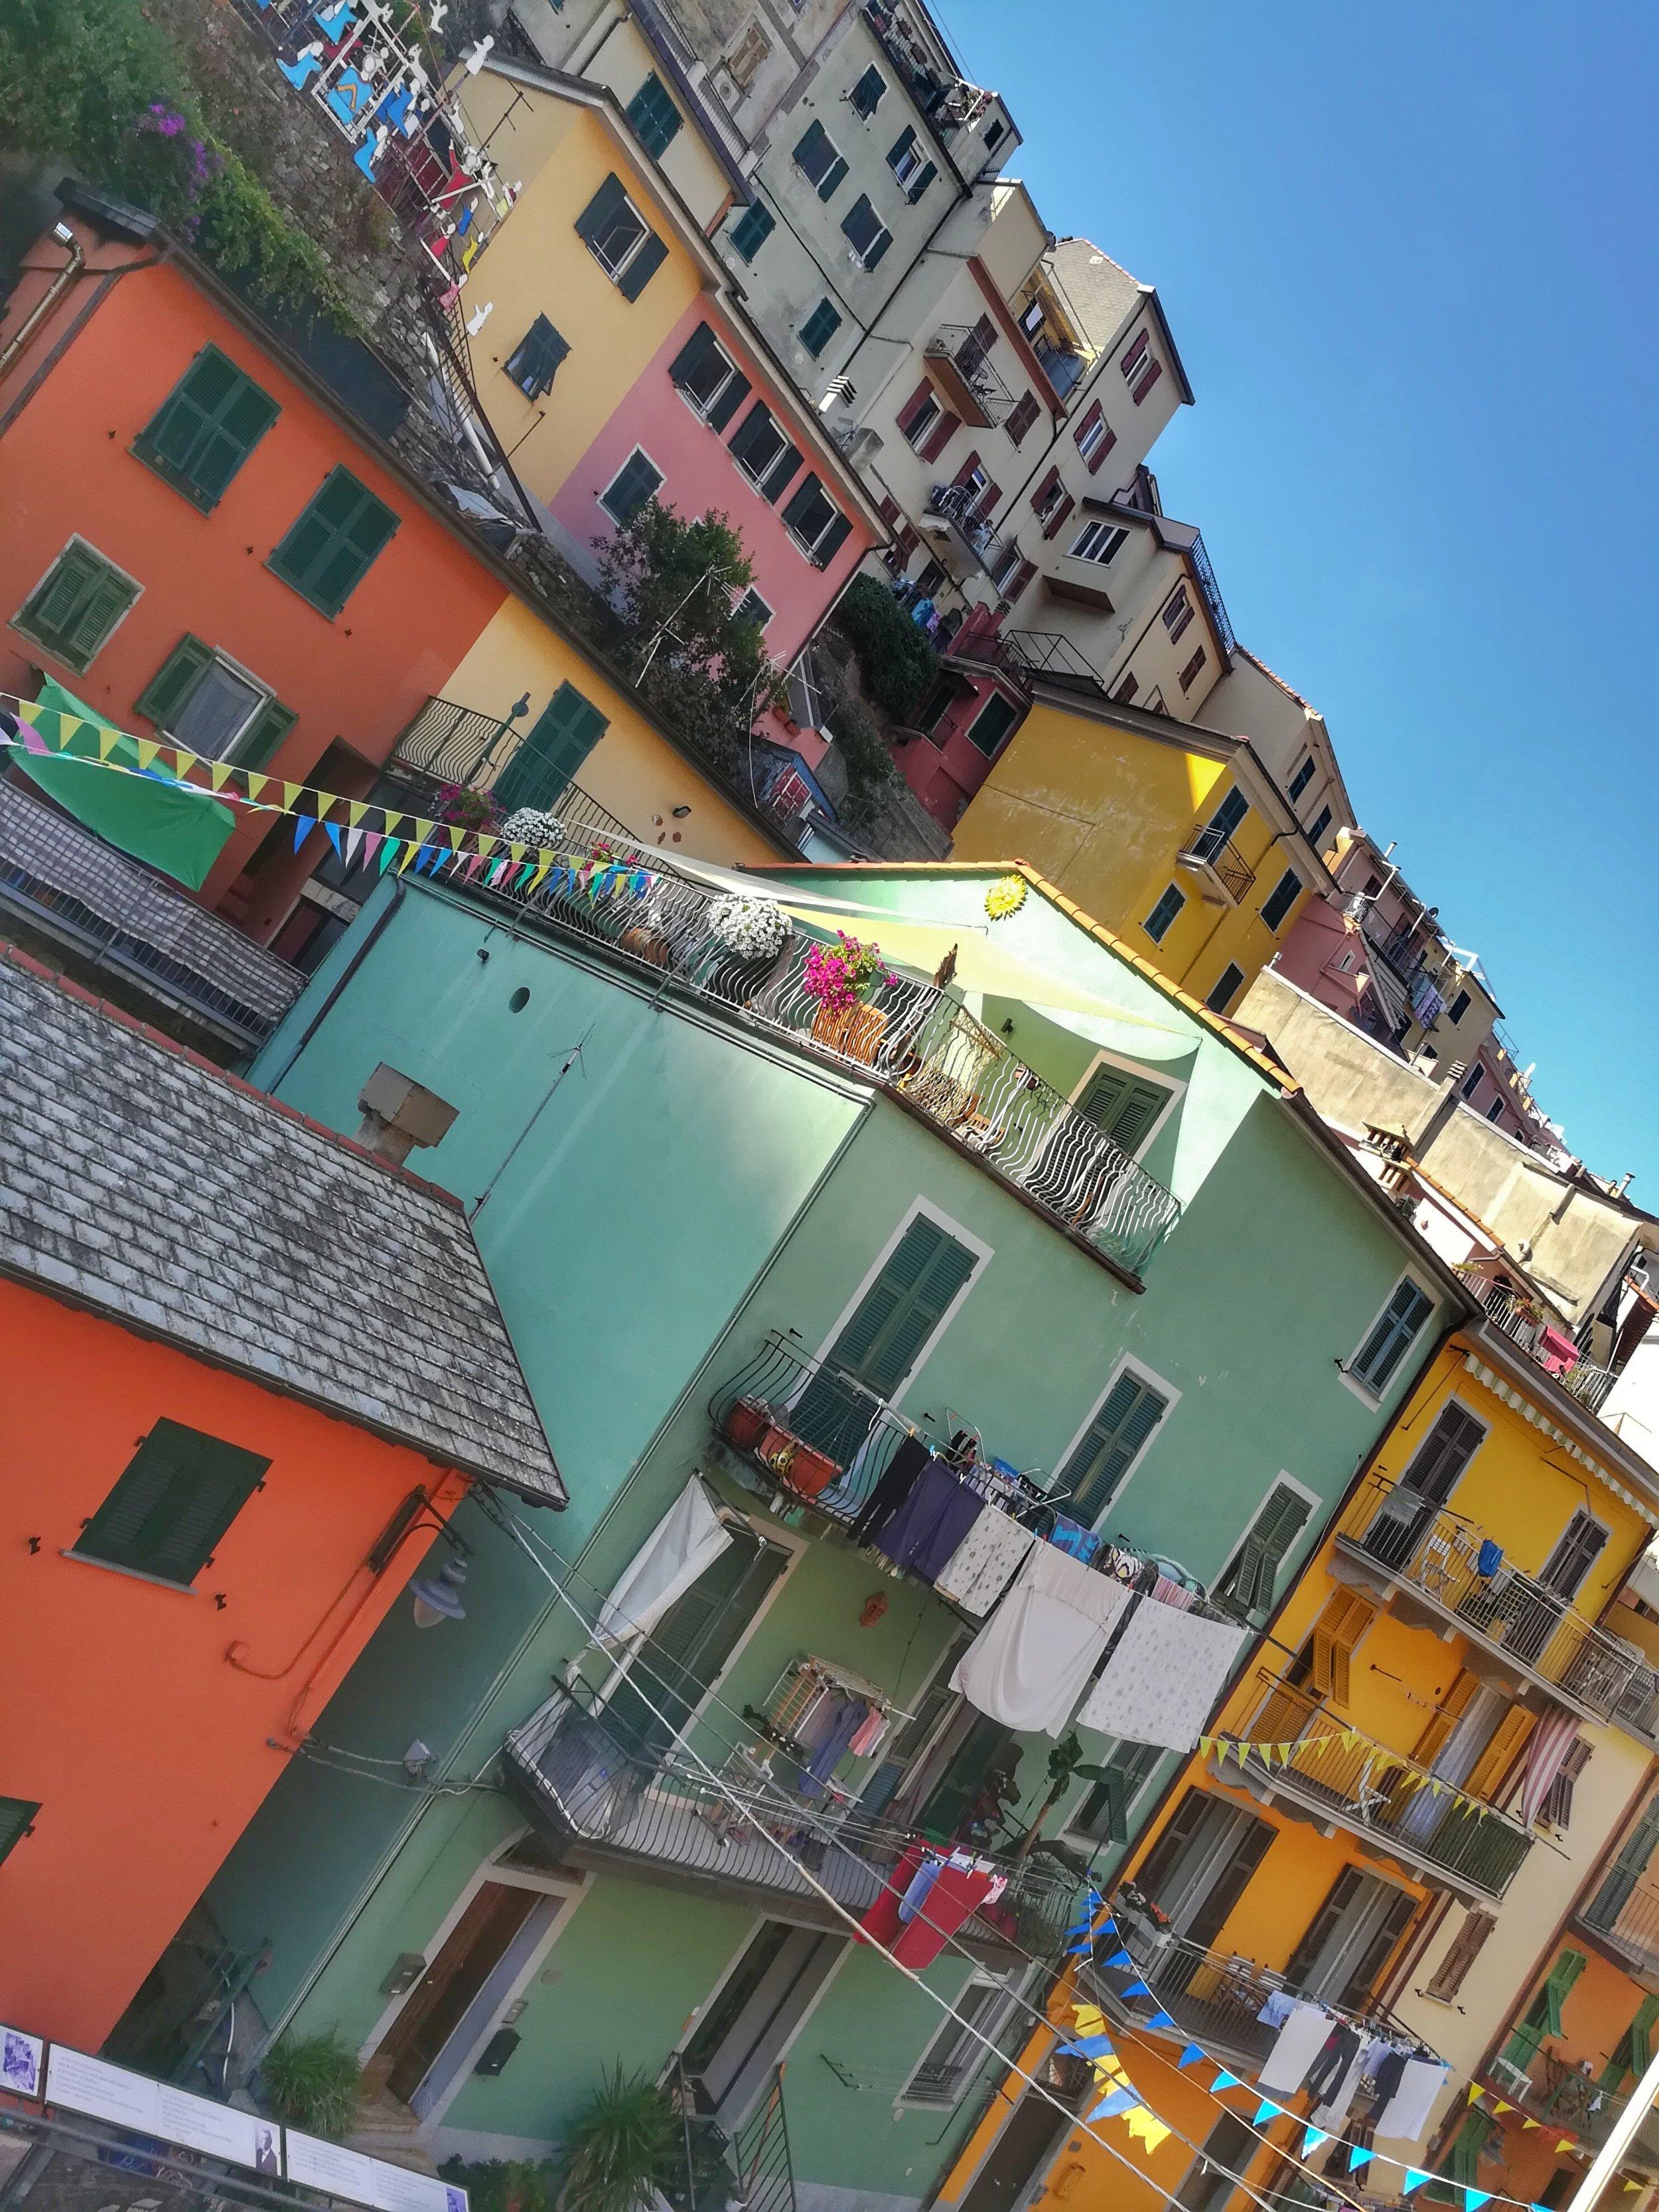 Fun colourful streets